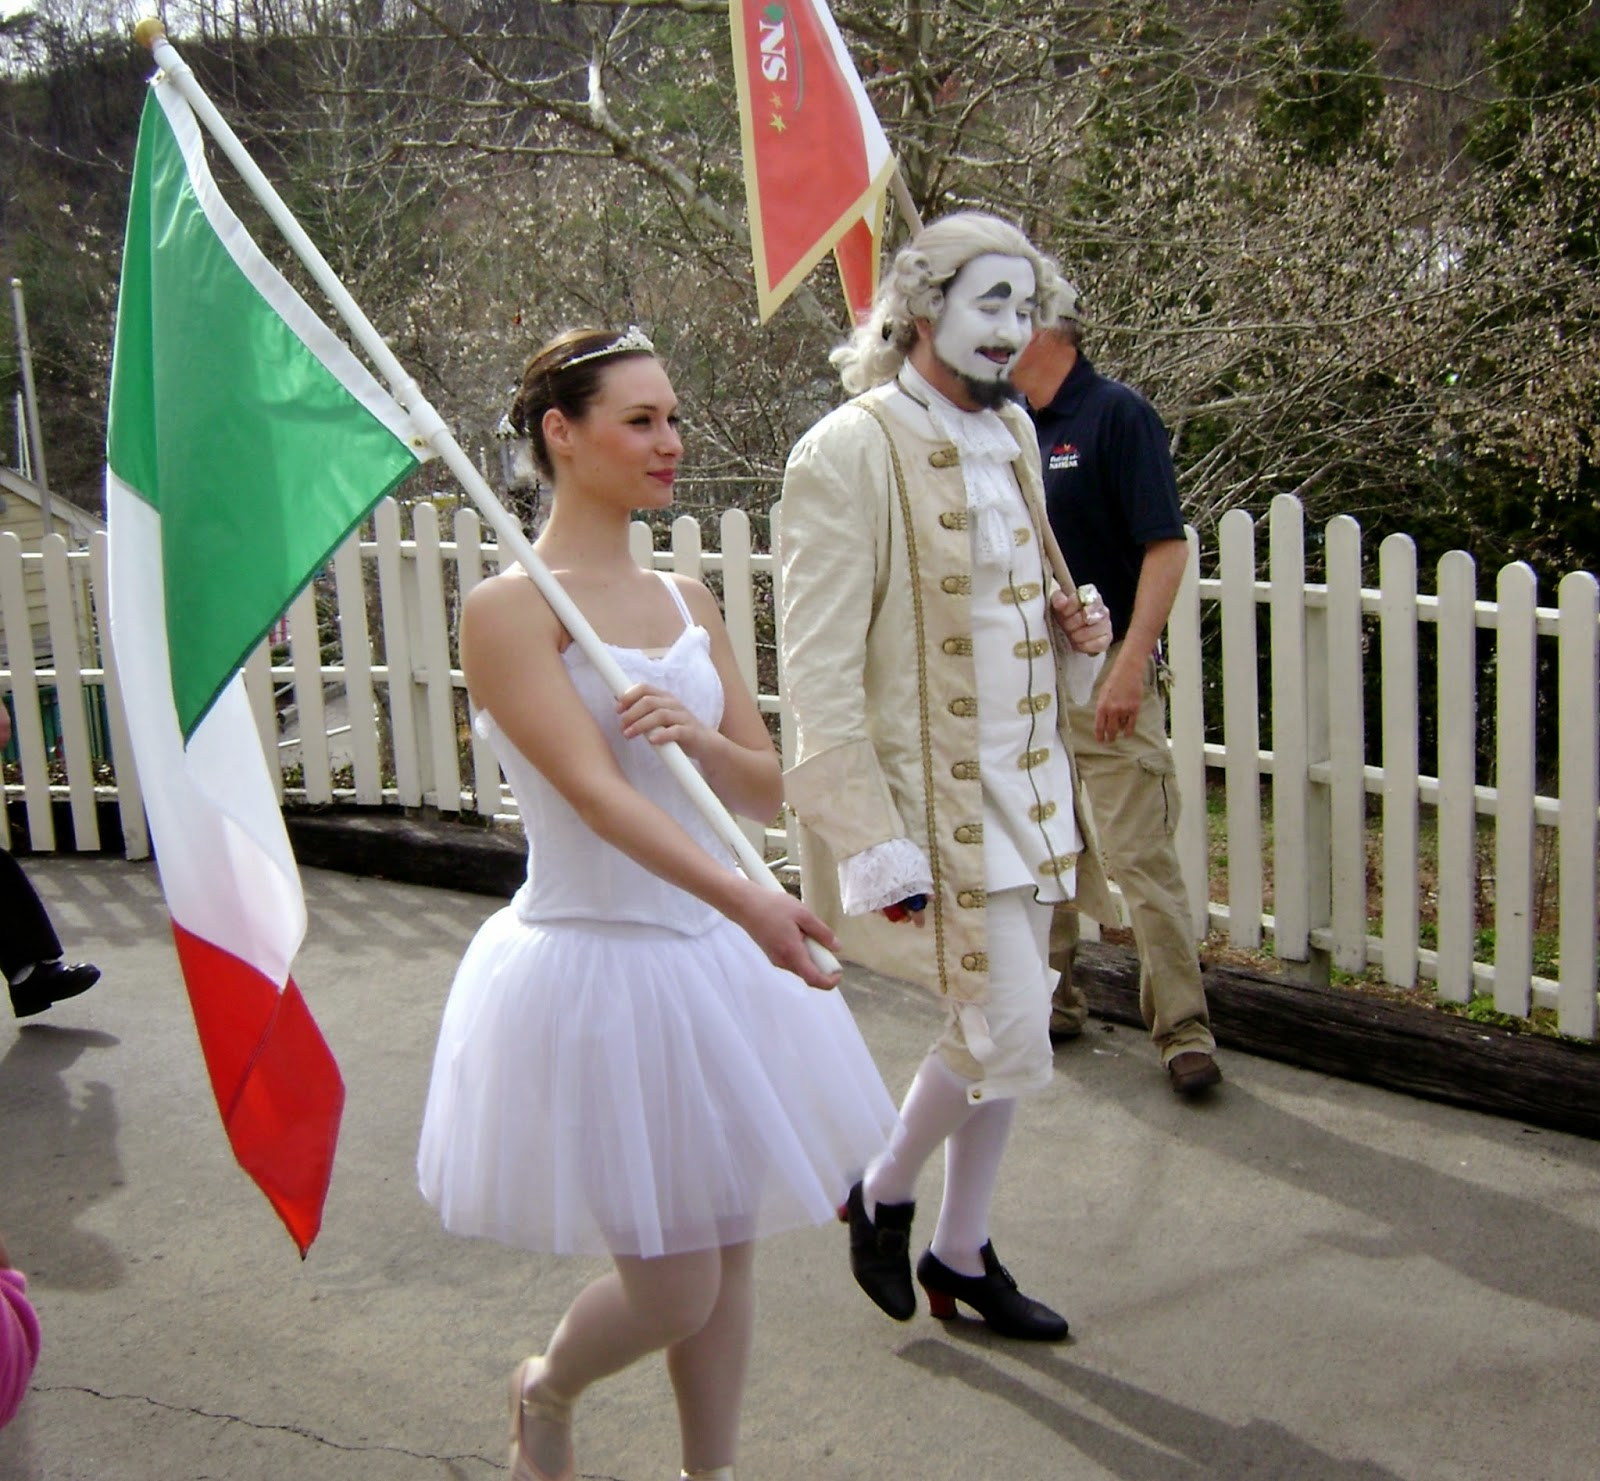 Dollywood+Festival+of+Nations+2014+Parade++%2826%29.JPG